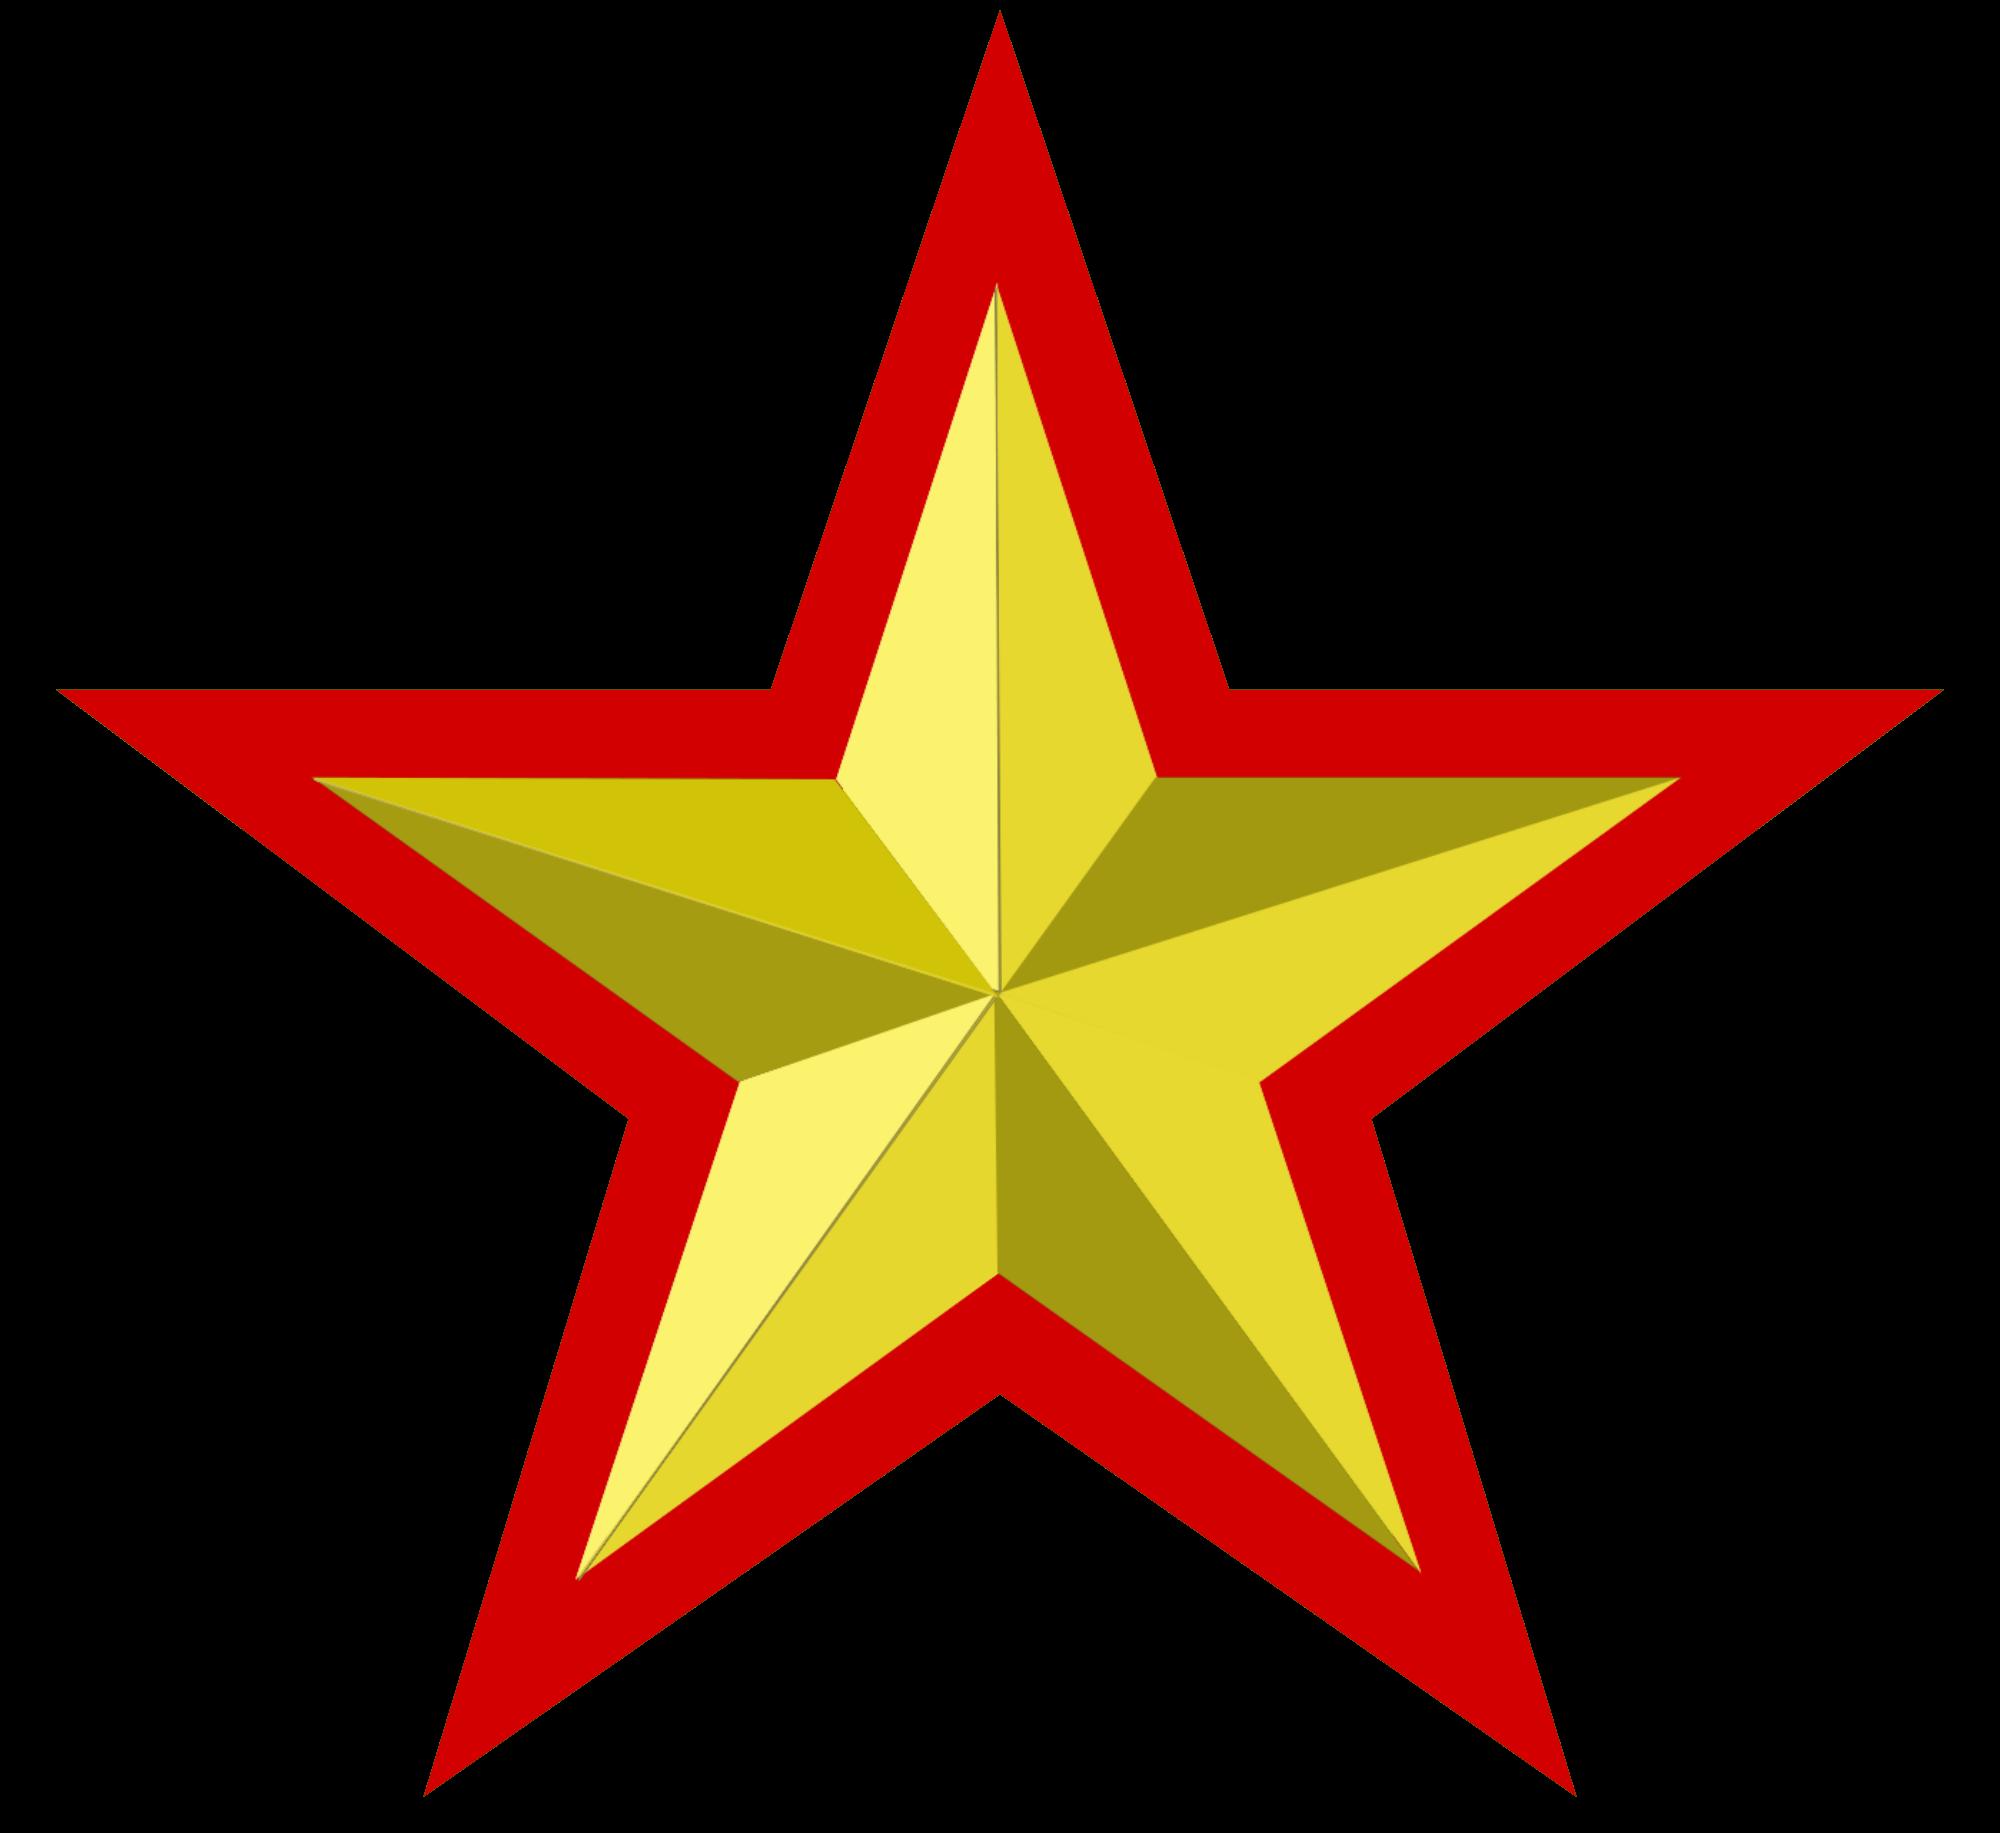 2000x1833 Clip Art Yellow Star 3 Clipart